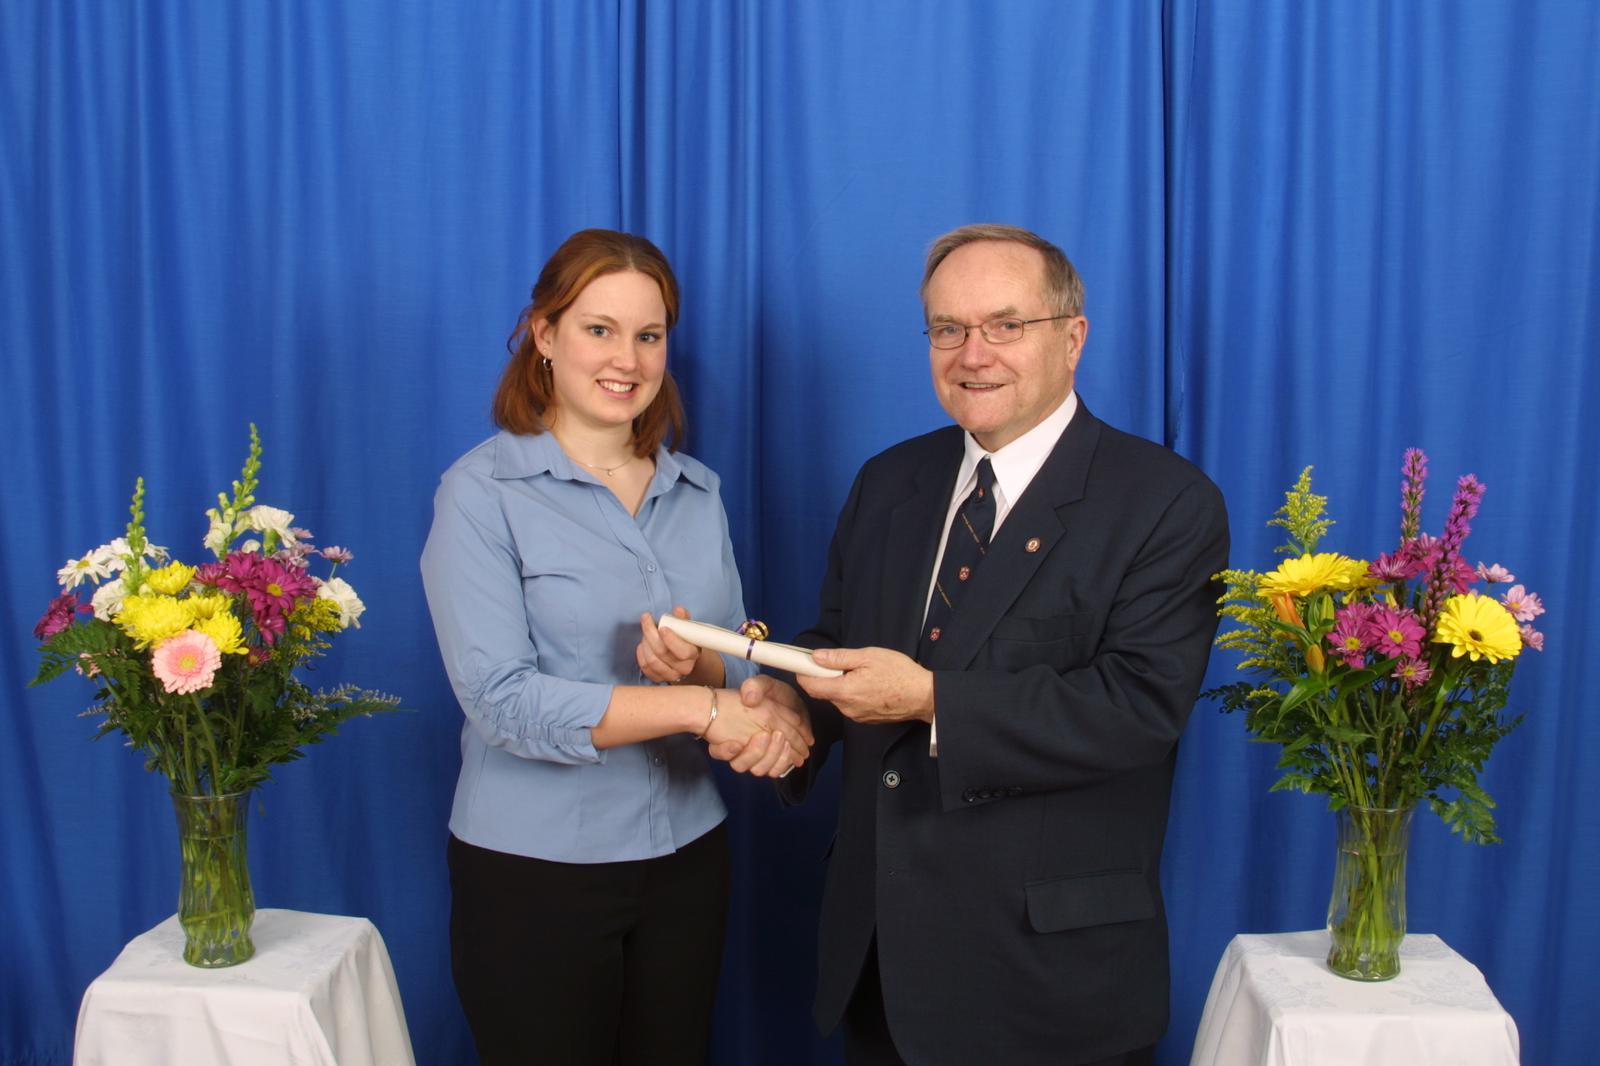 Robert Rosehart and student at Arts Awards, 2004